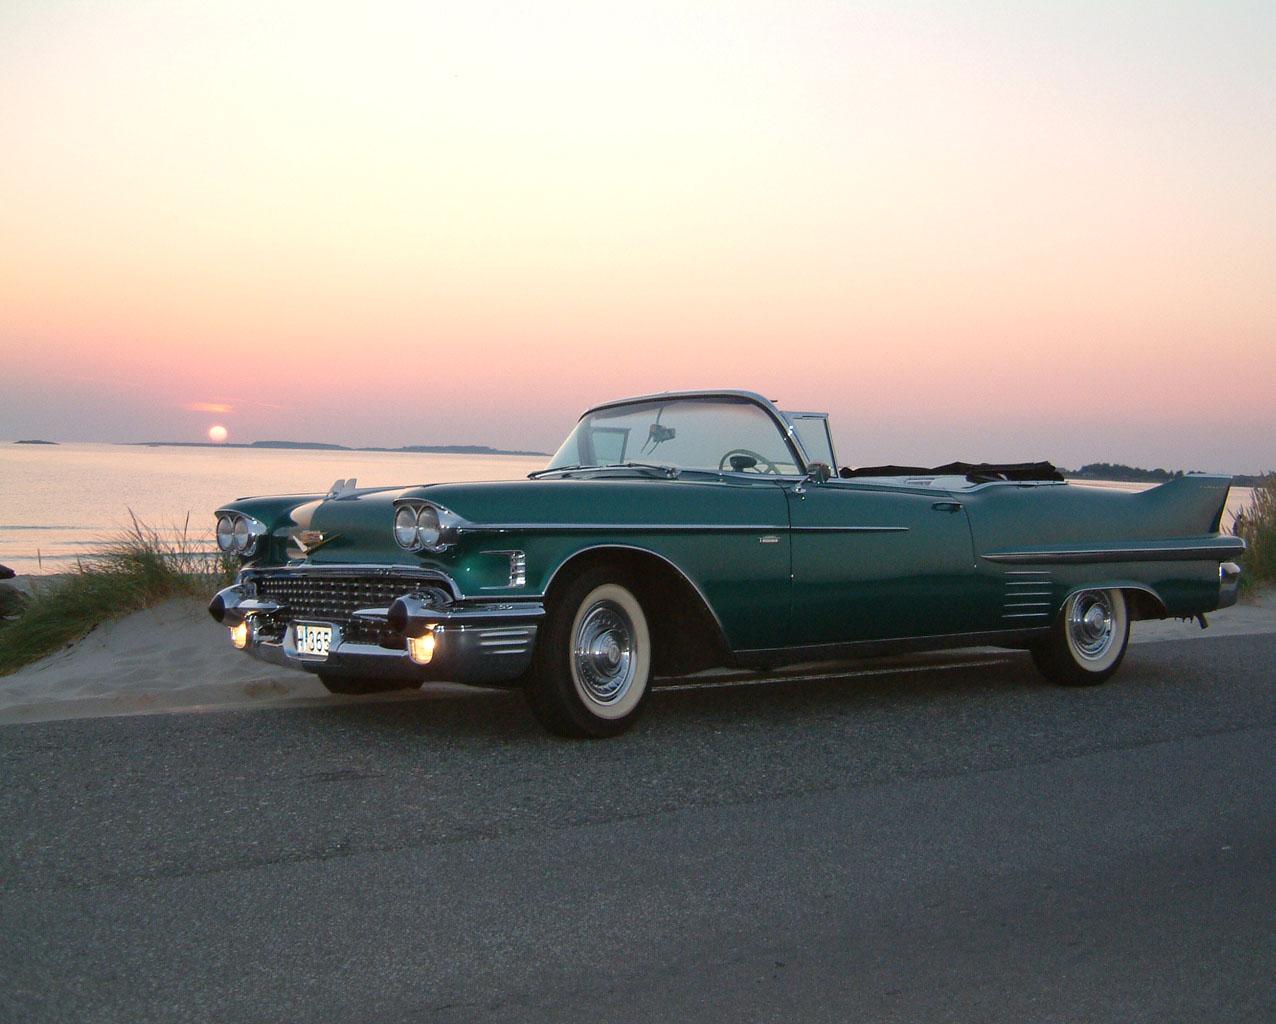 1958 Cadillac 1958 Cadillac